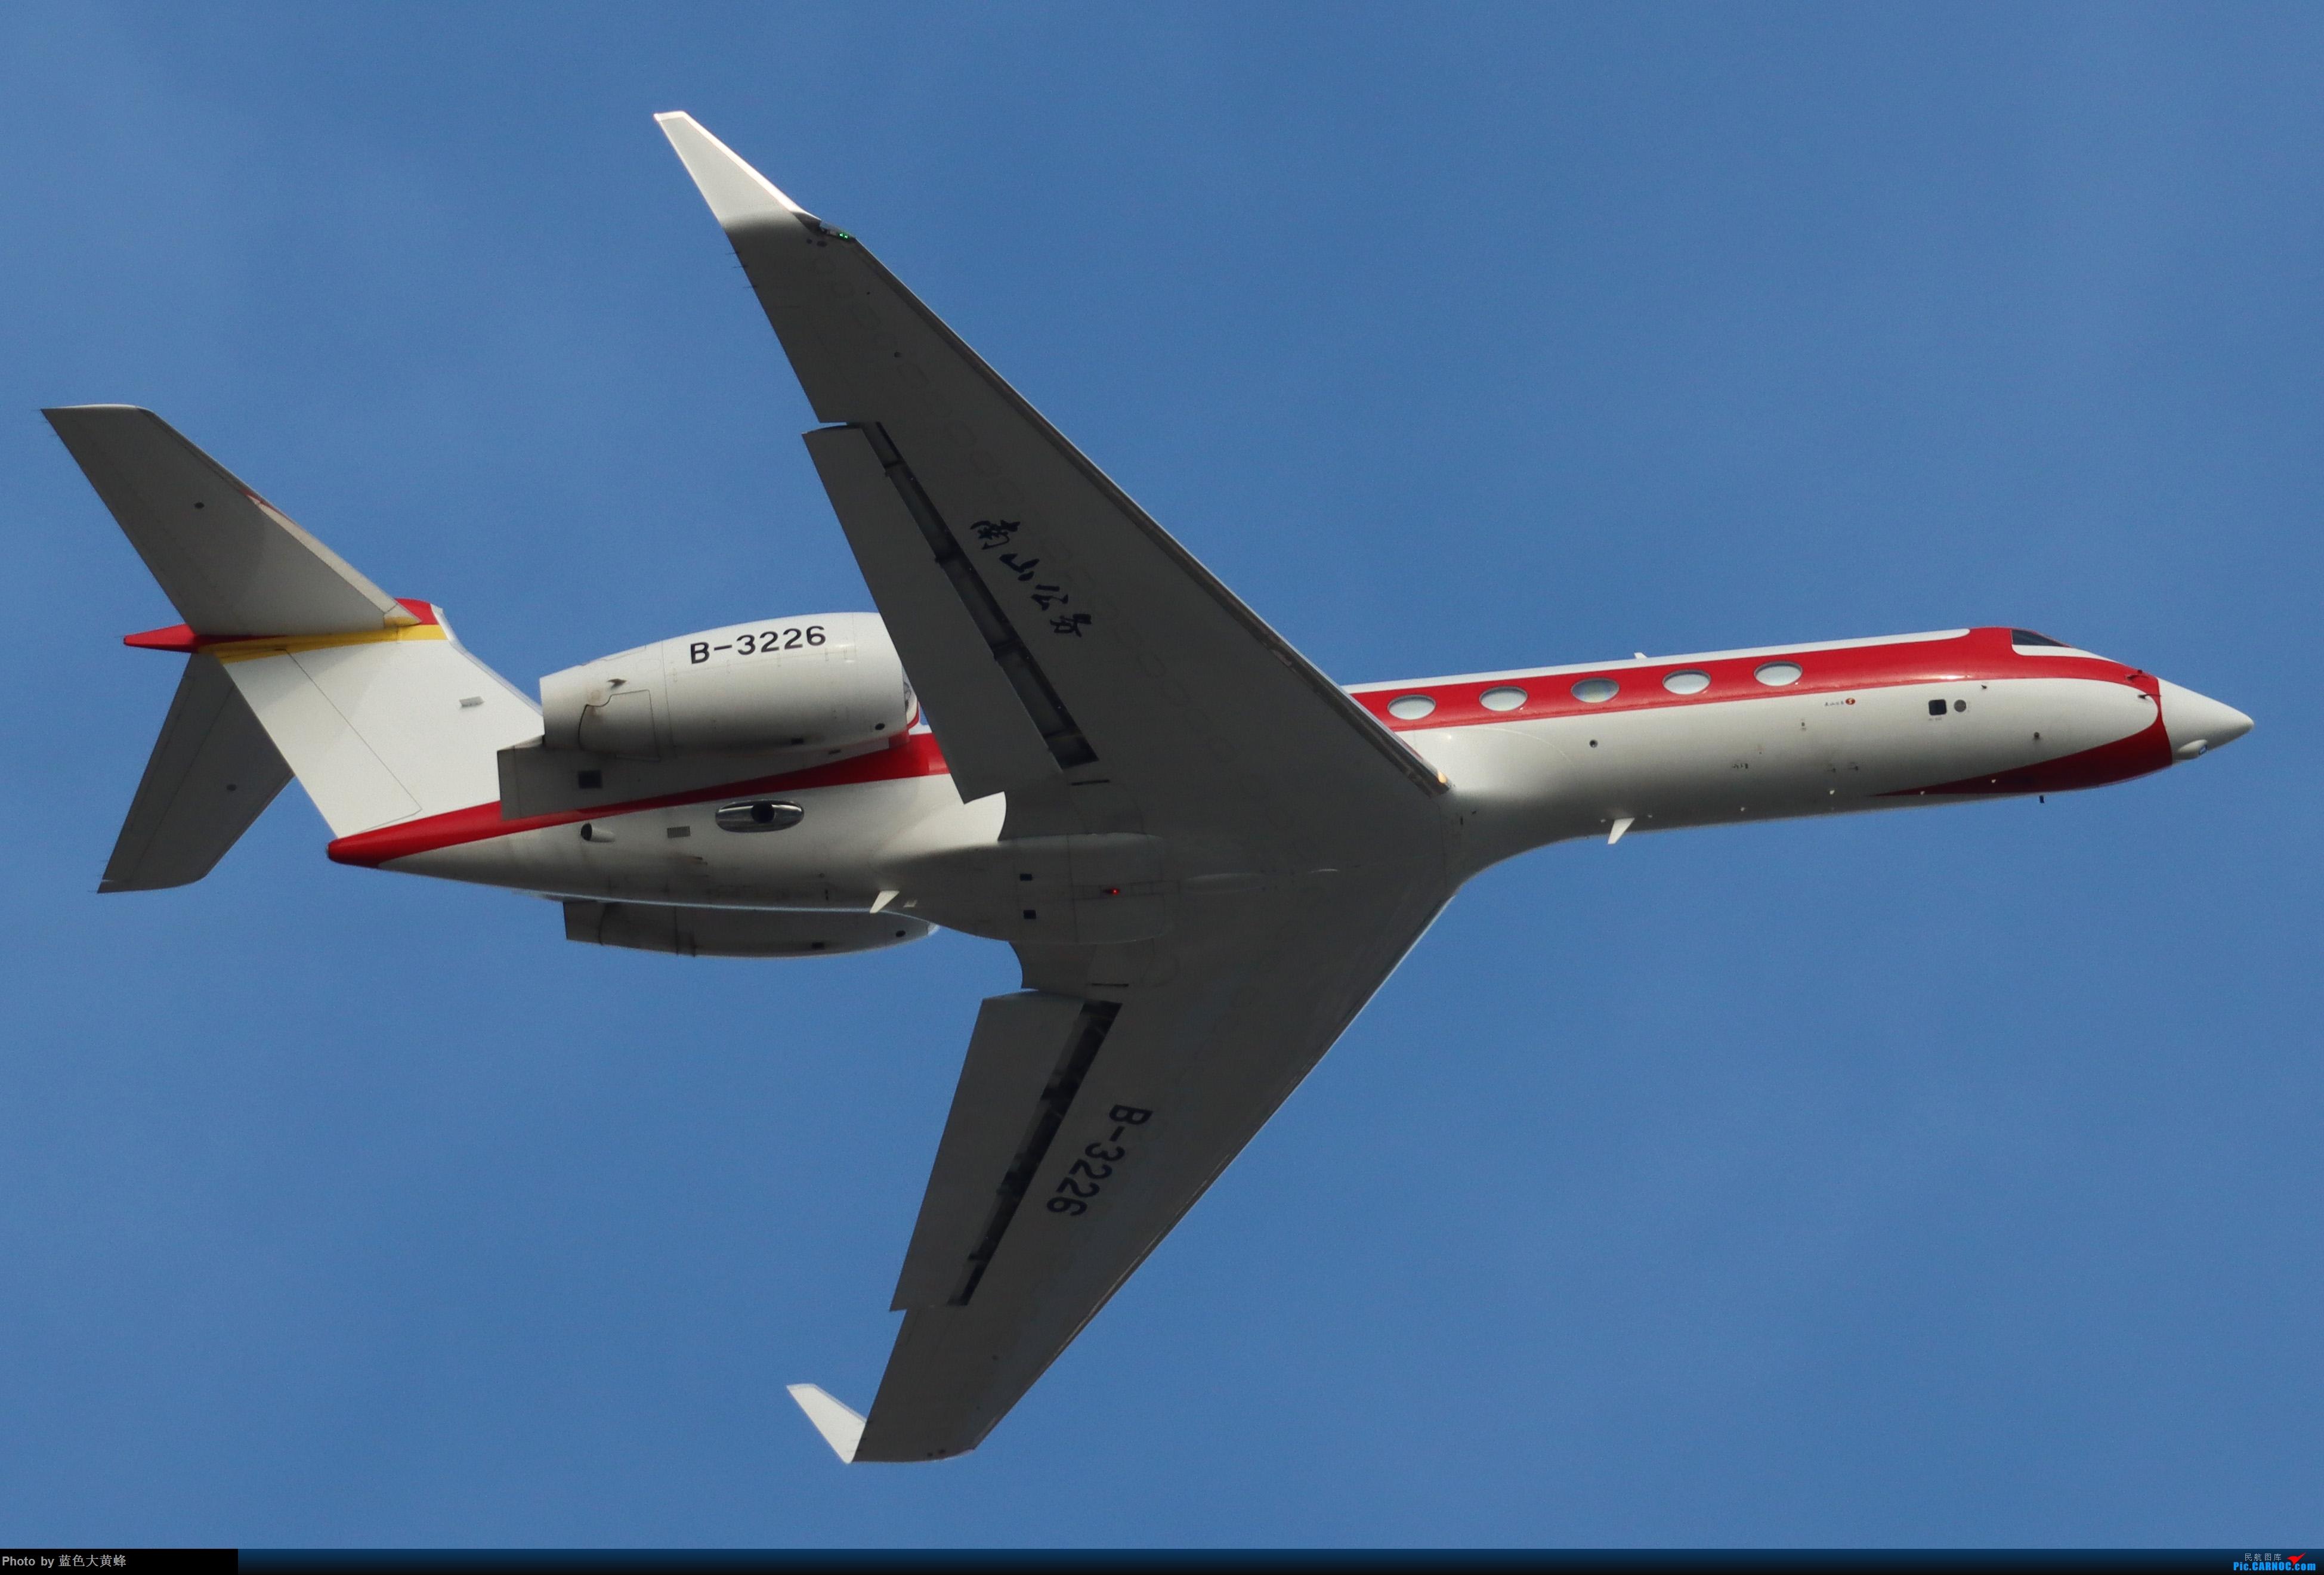 Re:[原创]PEK5.24随拍 GULFSTREAM G550 B-3226 中国北京首都国际机场